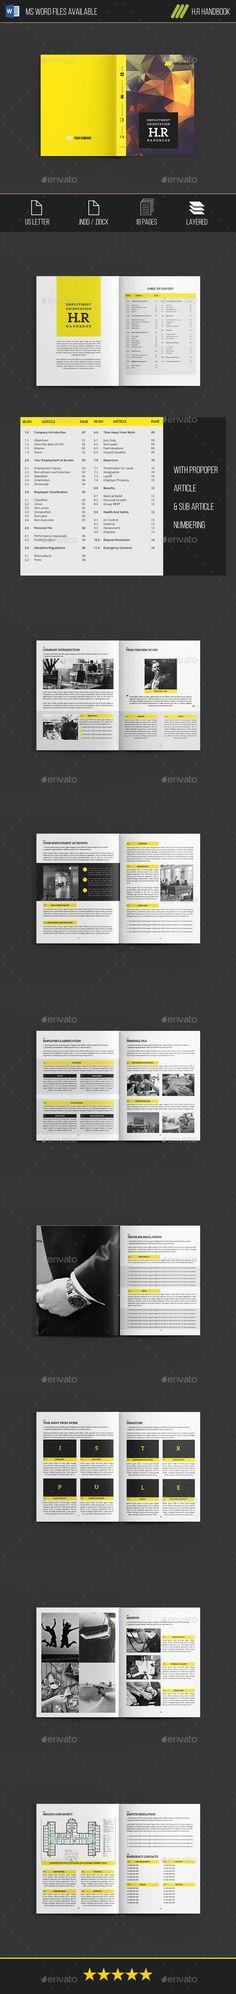 Funeral Program Template Program template, Template and Brochures